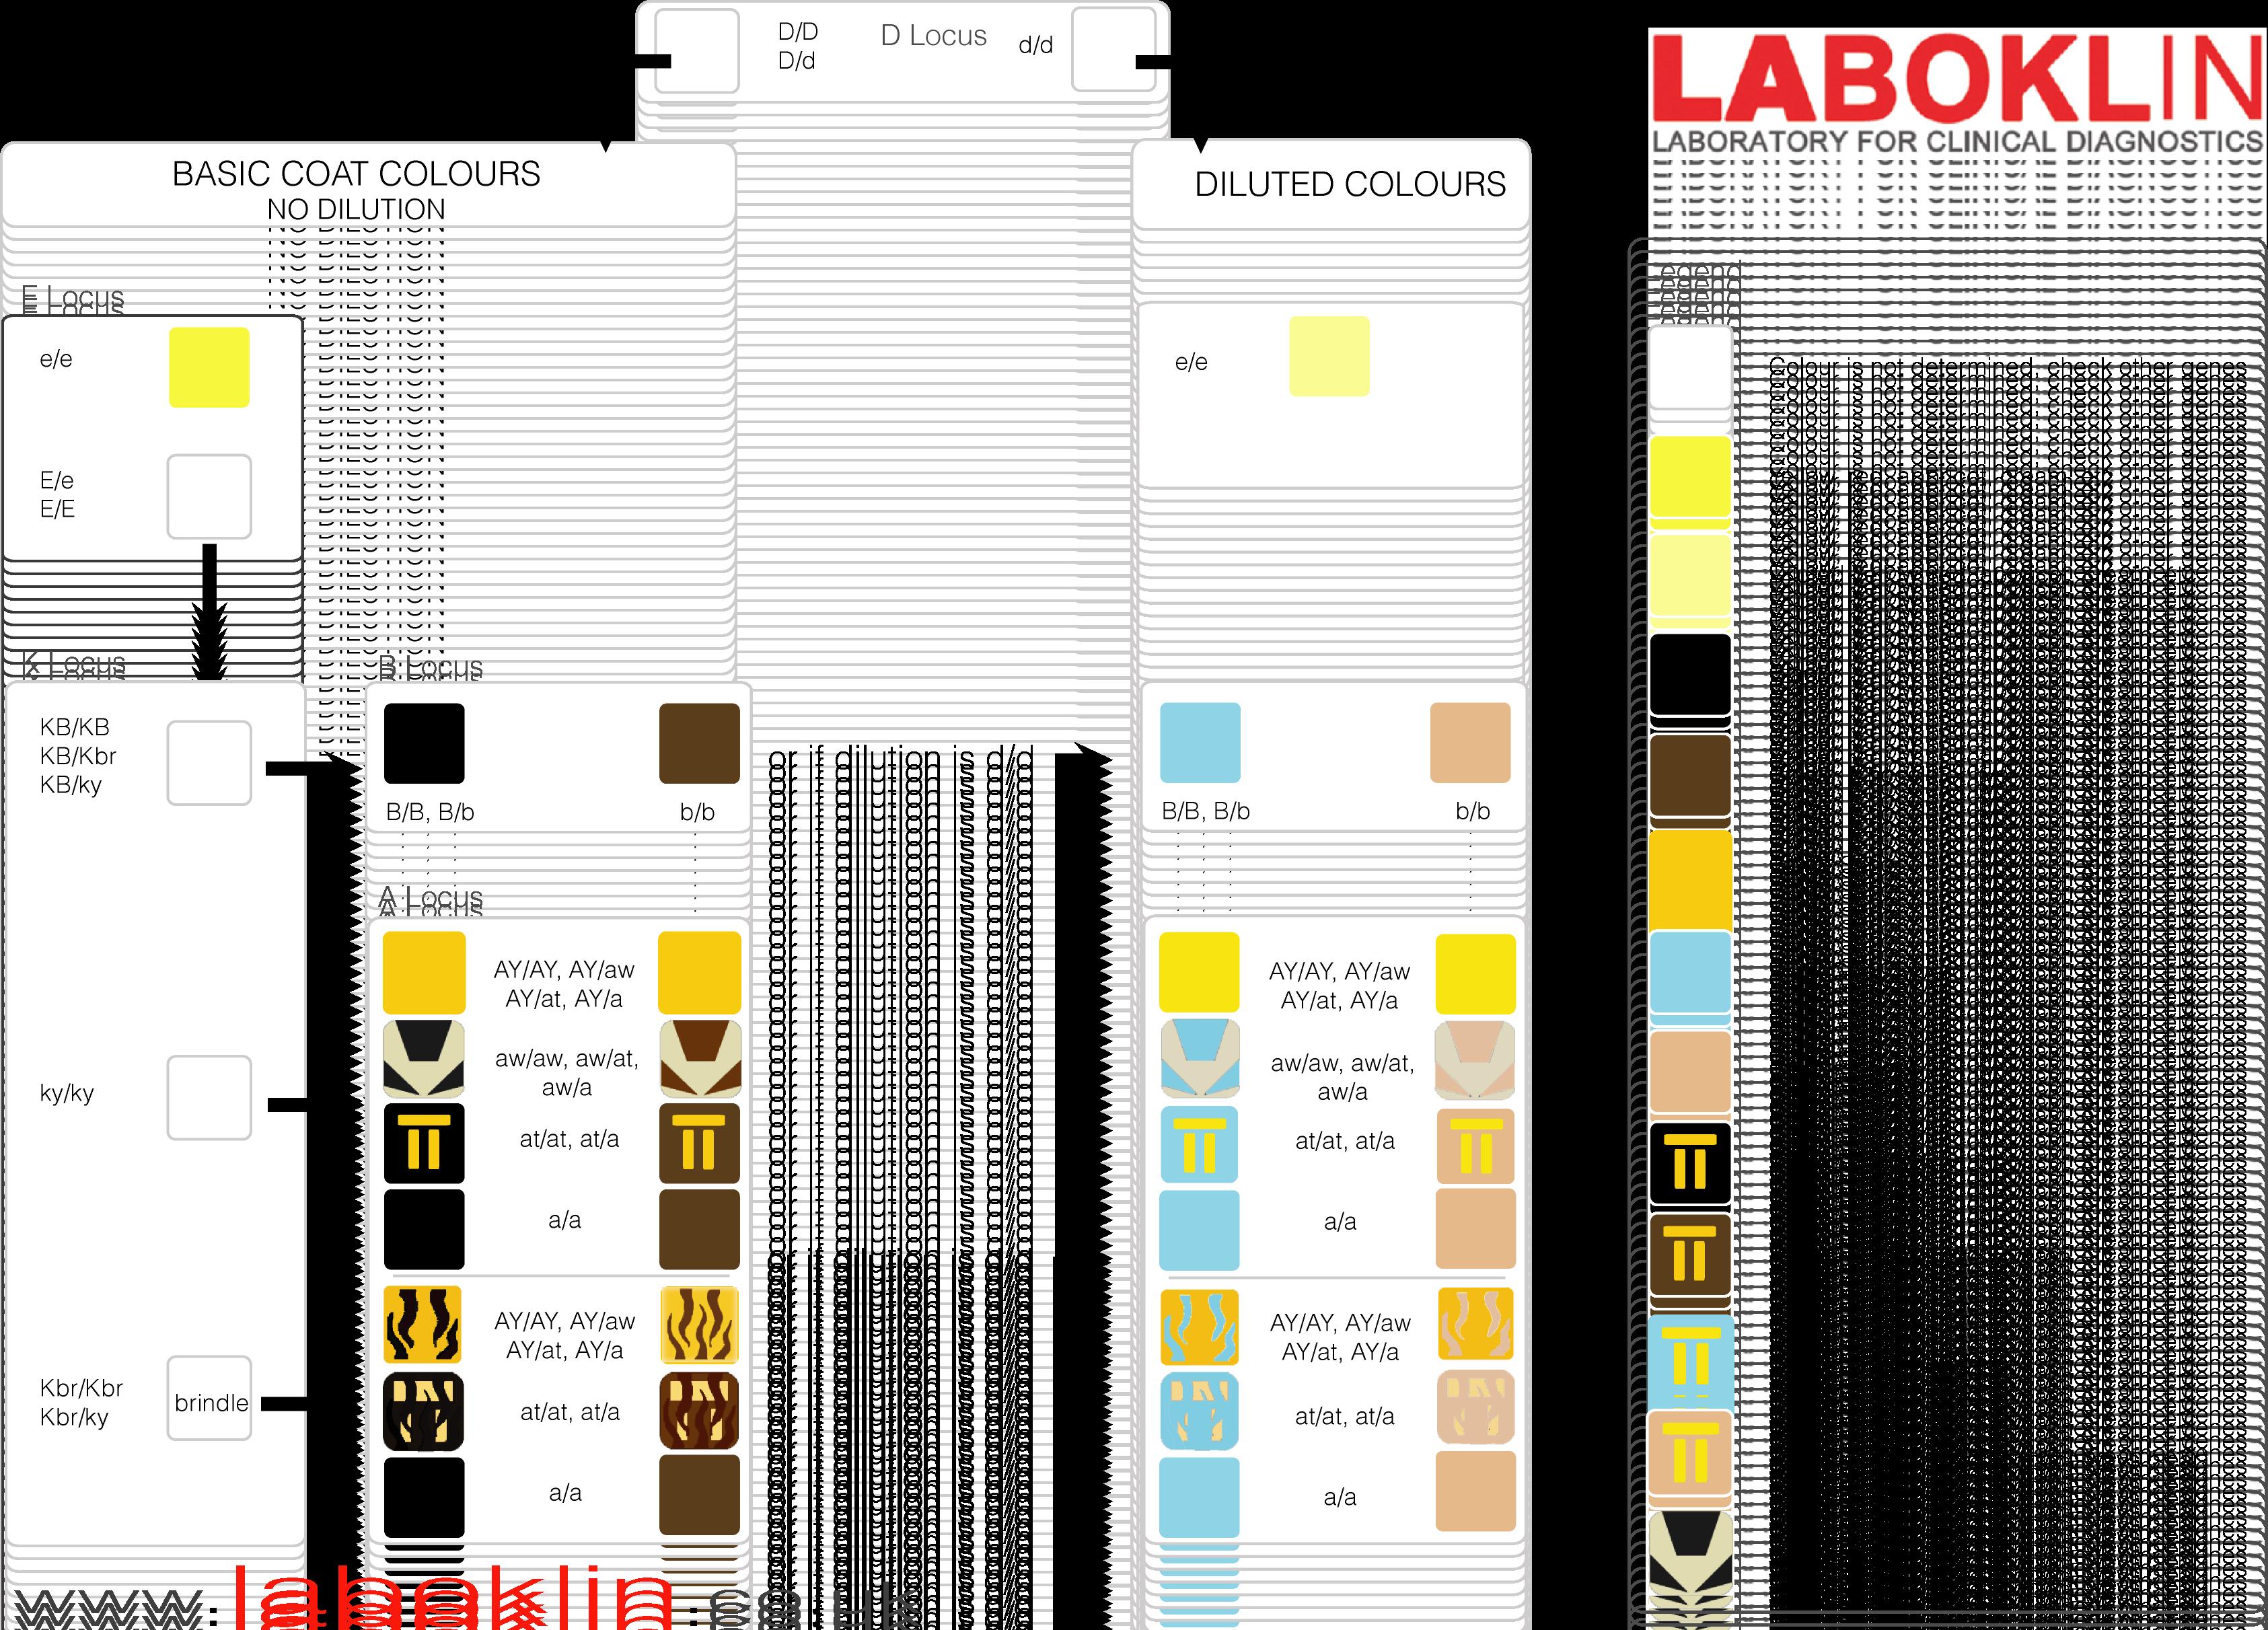 Coat Colour Inheritance Chart 1